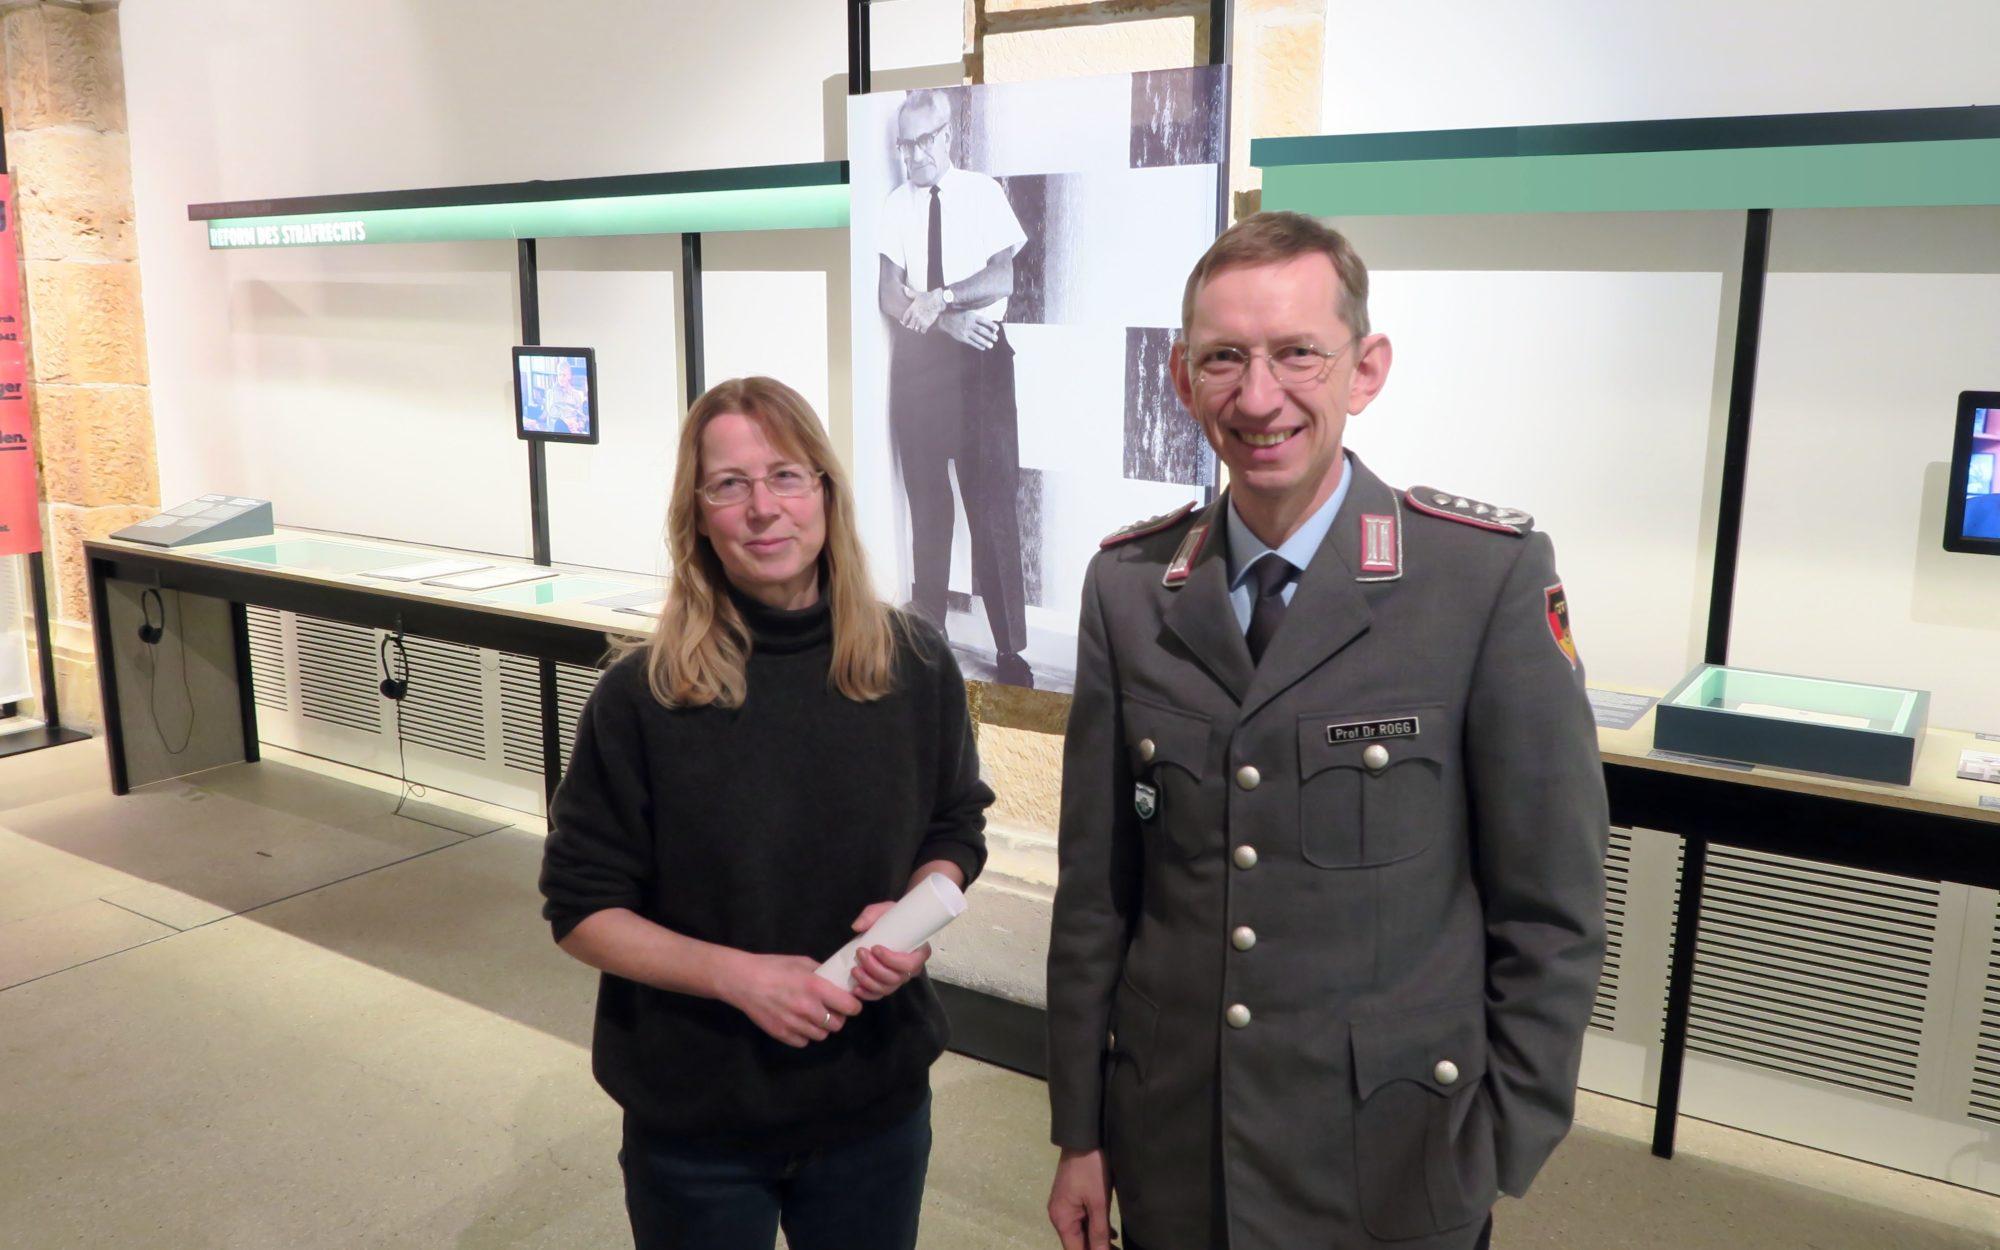 Kuratorin Monika Boll und Museumsdirektor Matthias Rogg